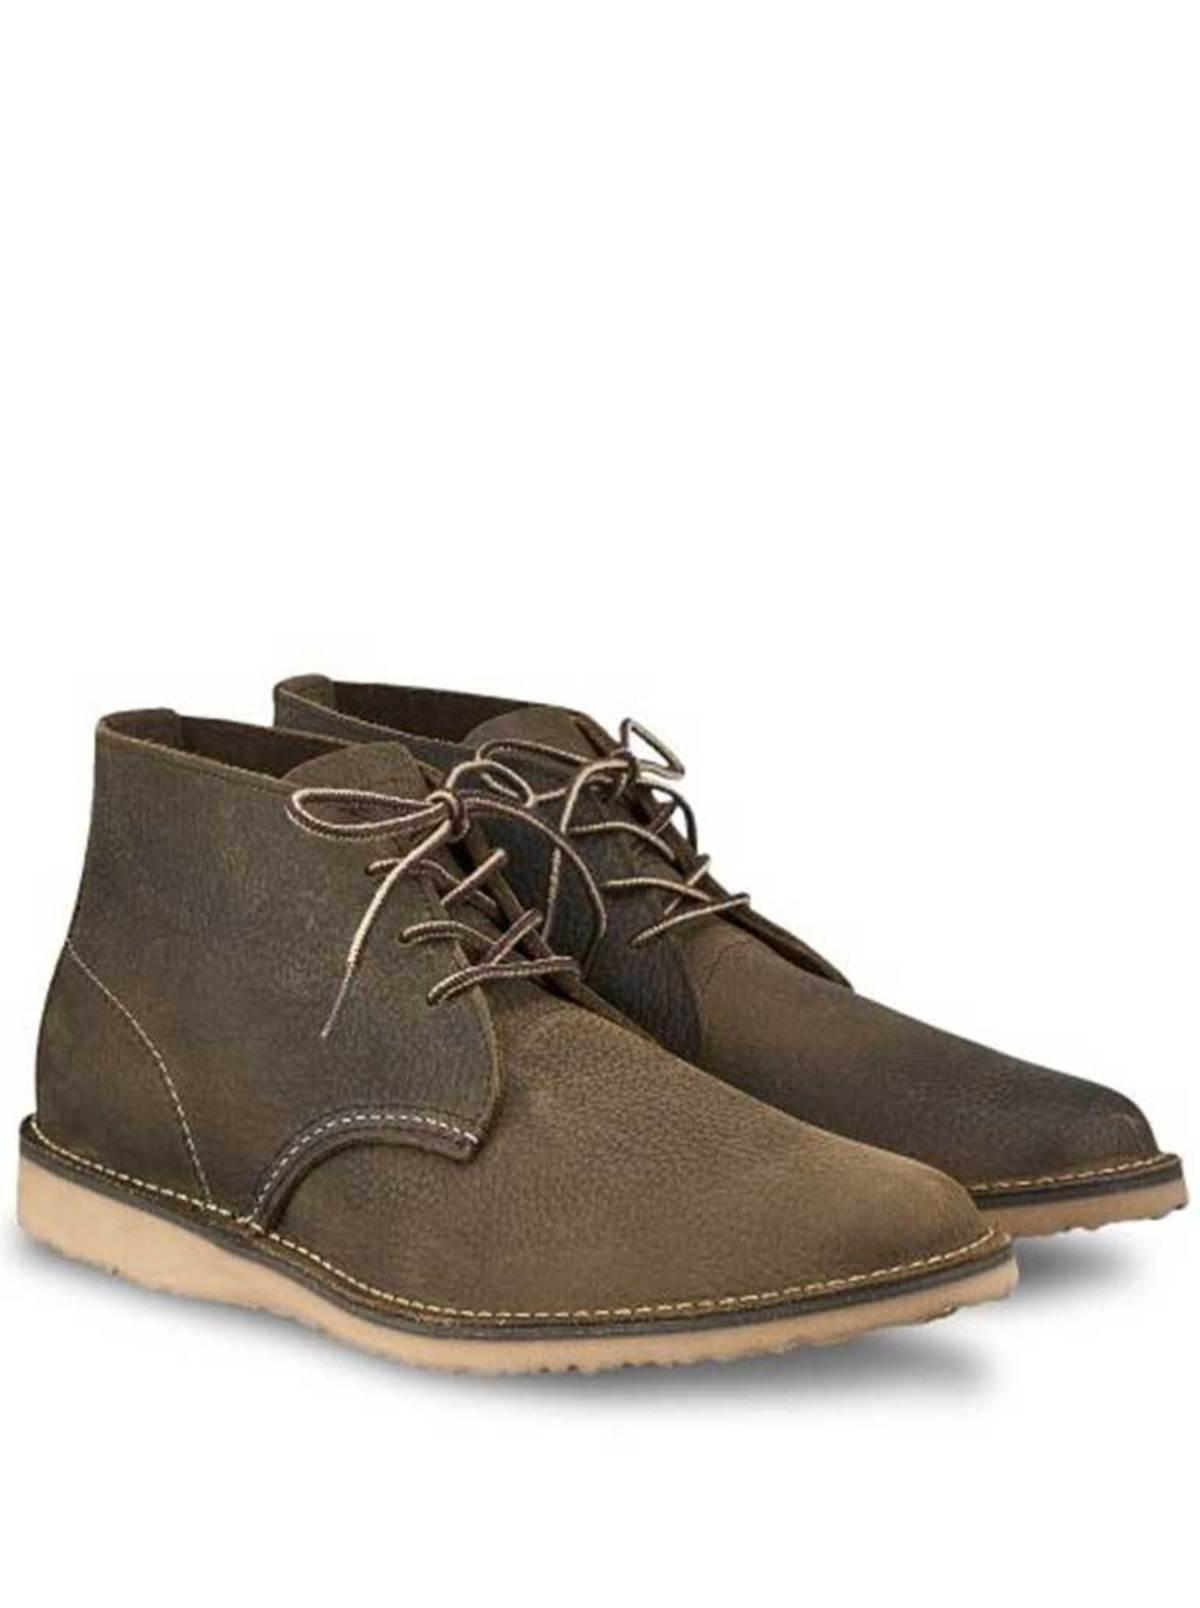 Redwing Shoes Weekender Chukka Boot